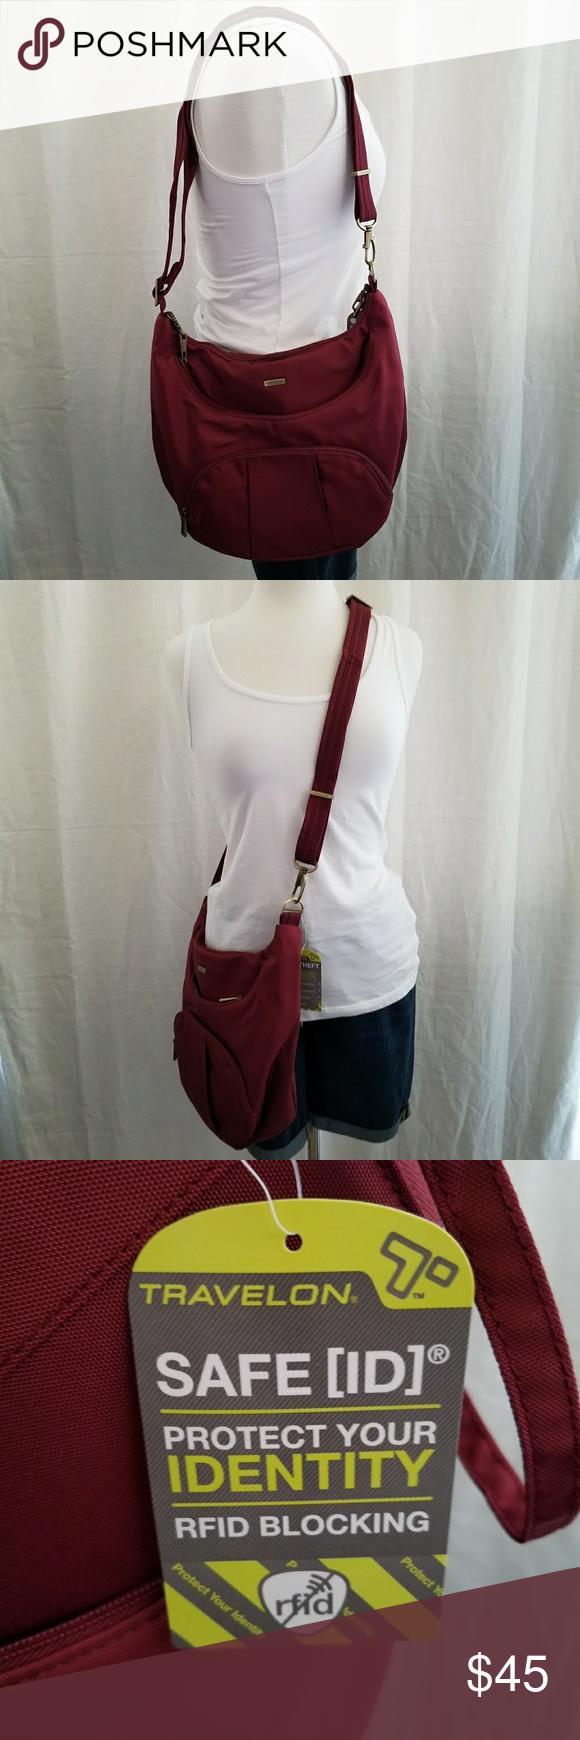 Crossbody Bags · Slip On · Purses · Travelon Anti-Theft Purse  amp  Wallet Travelon  Anti-Theft Purse w  adjustable 199b9cdc72